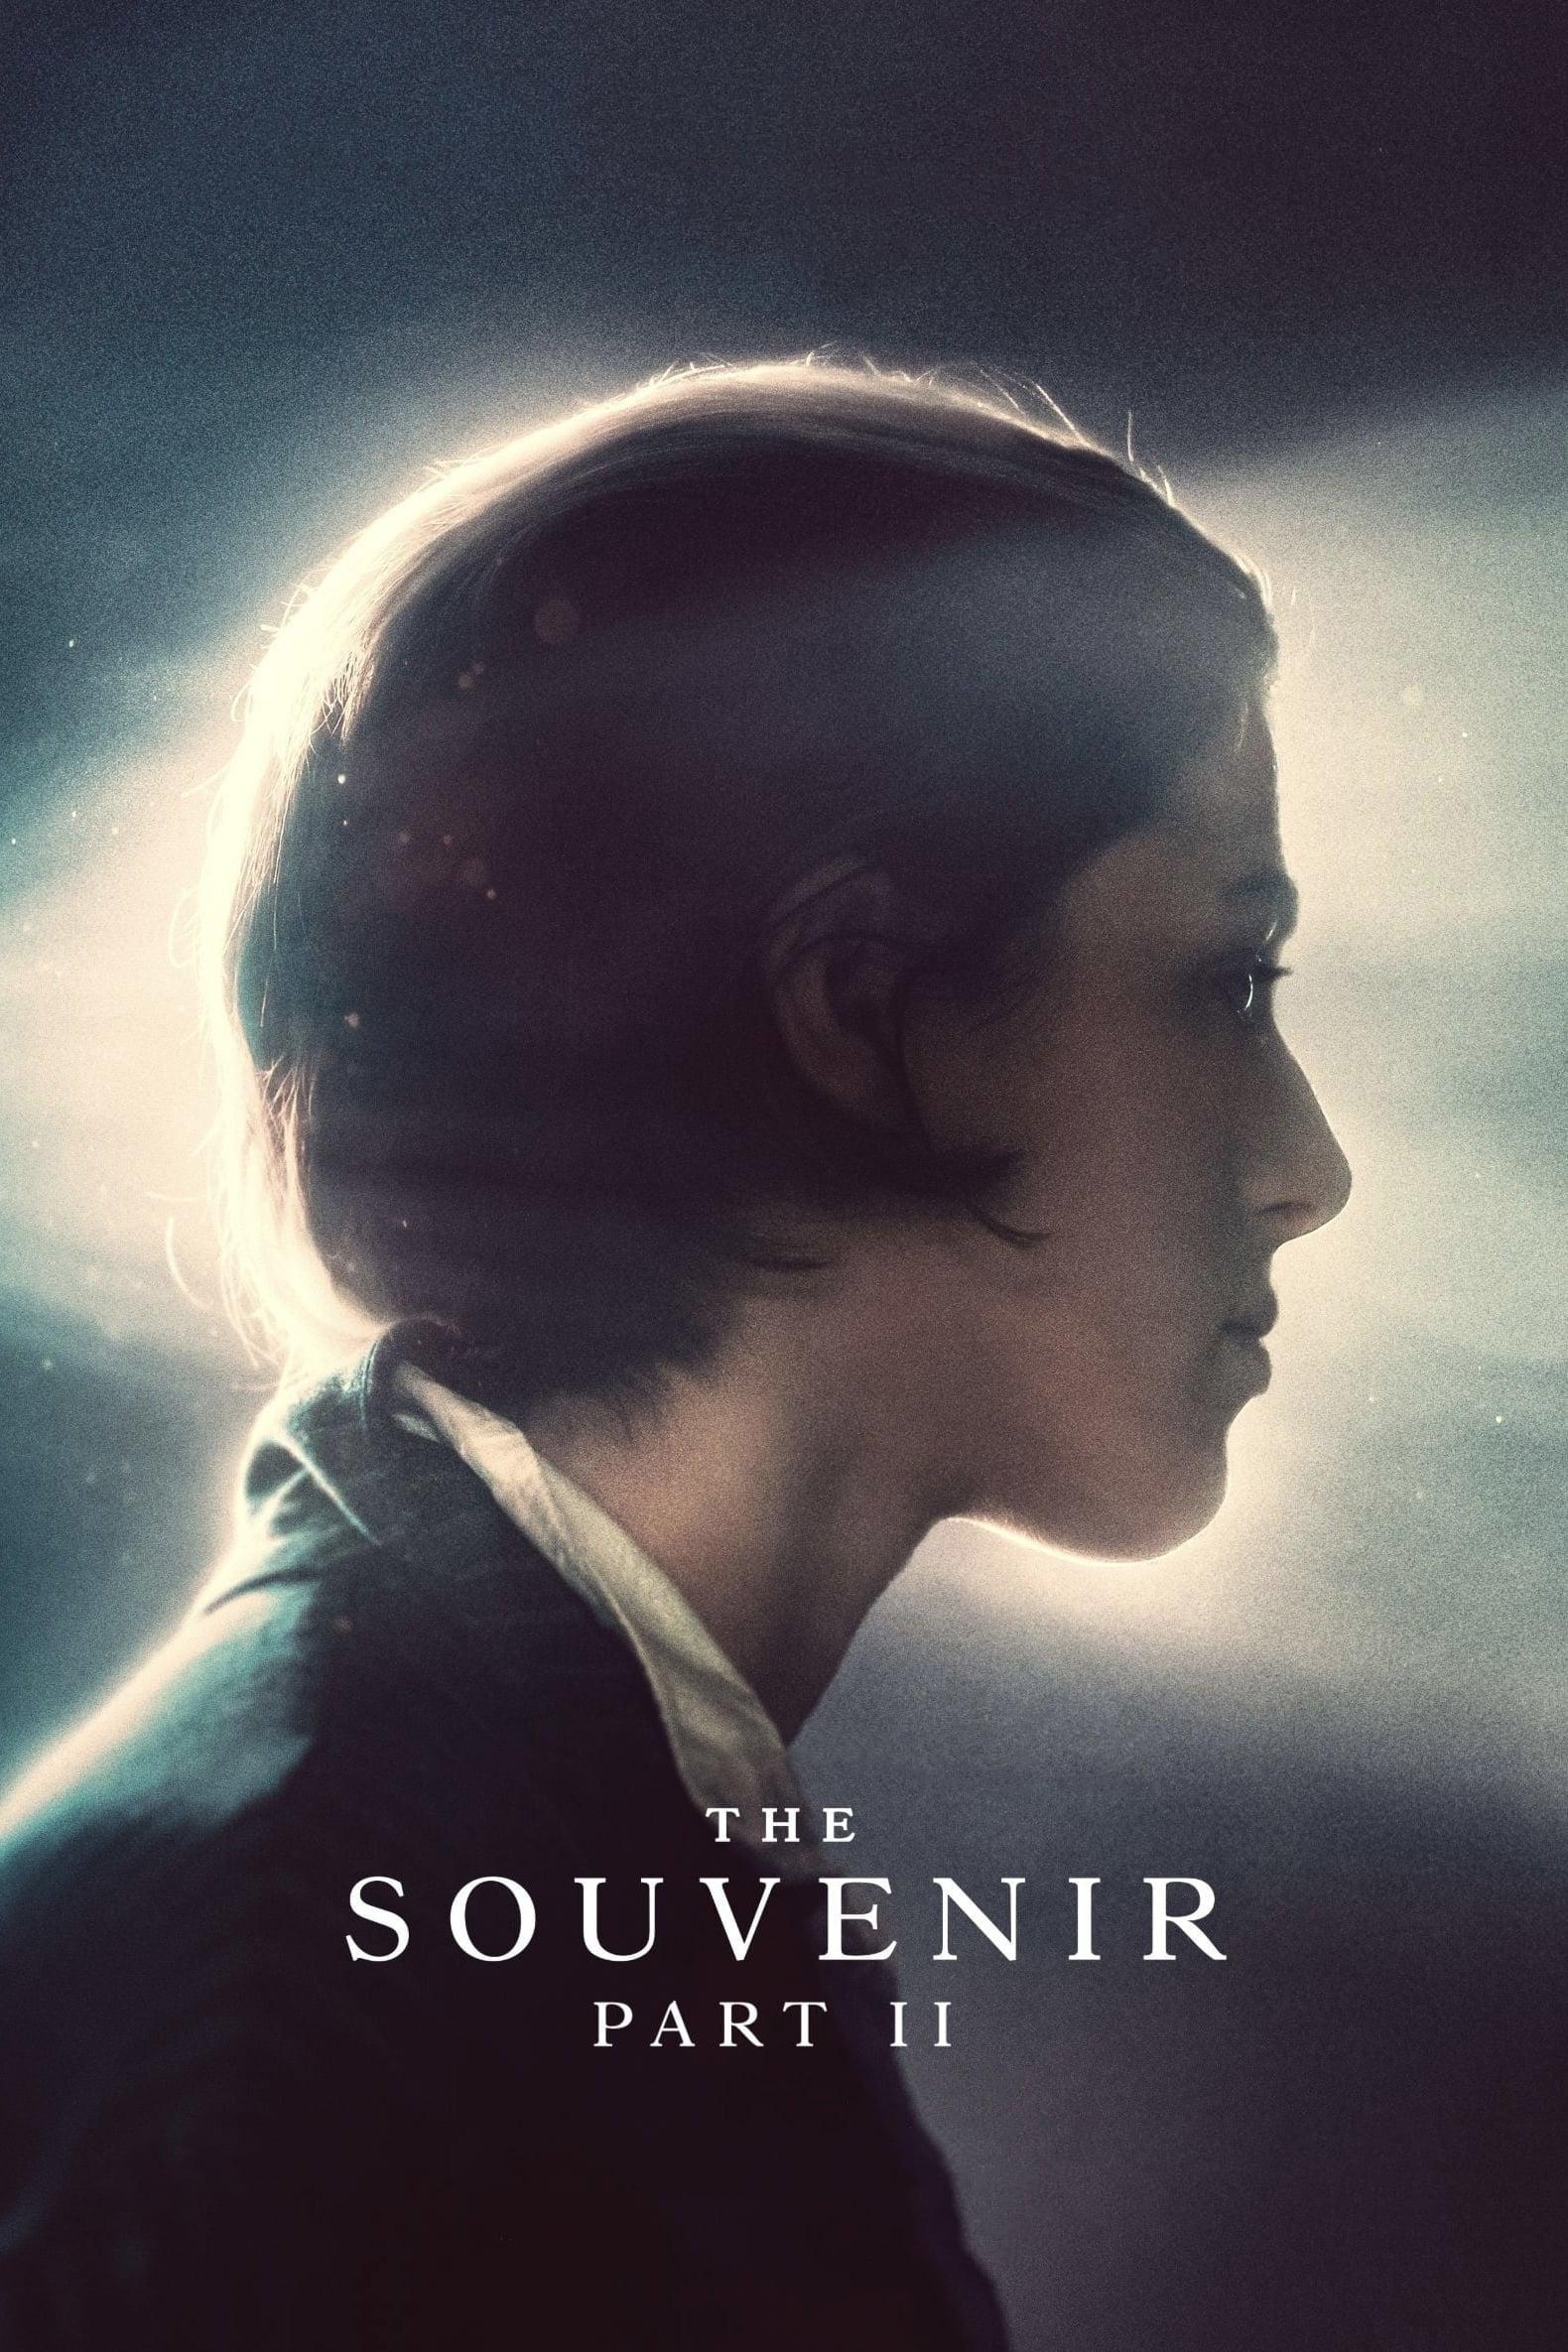 The Souvenir Part II poster